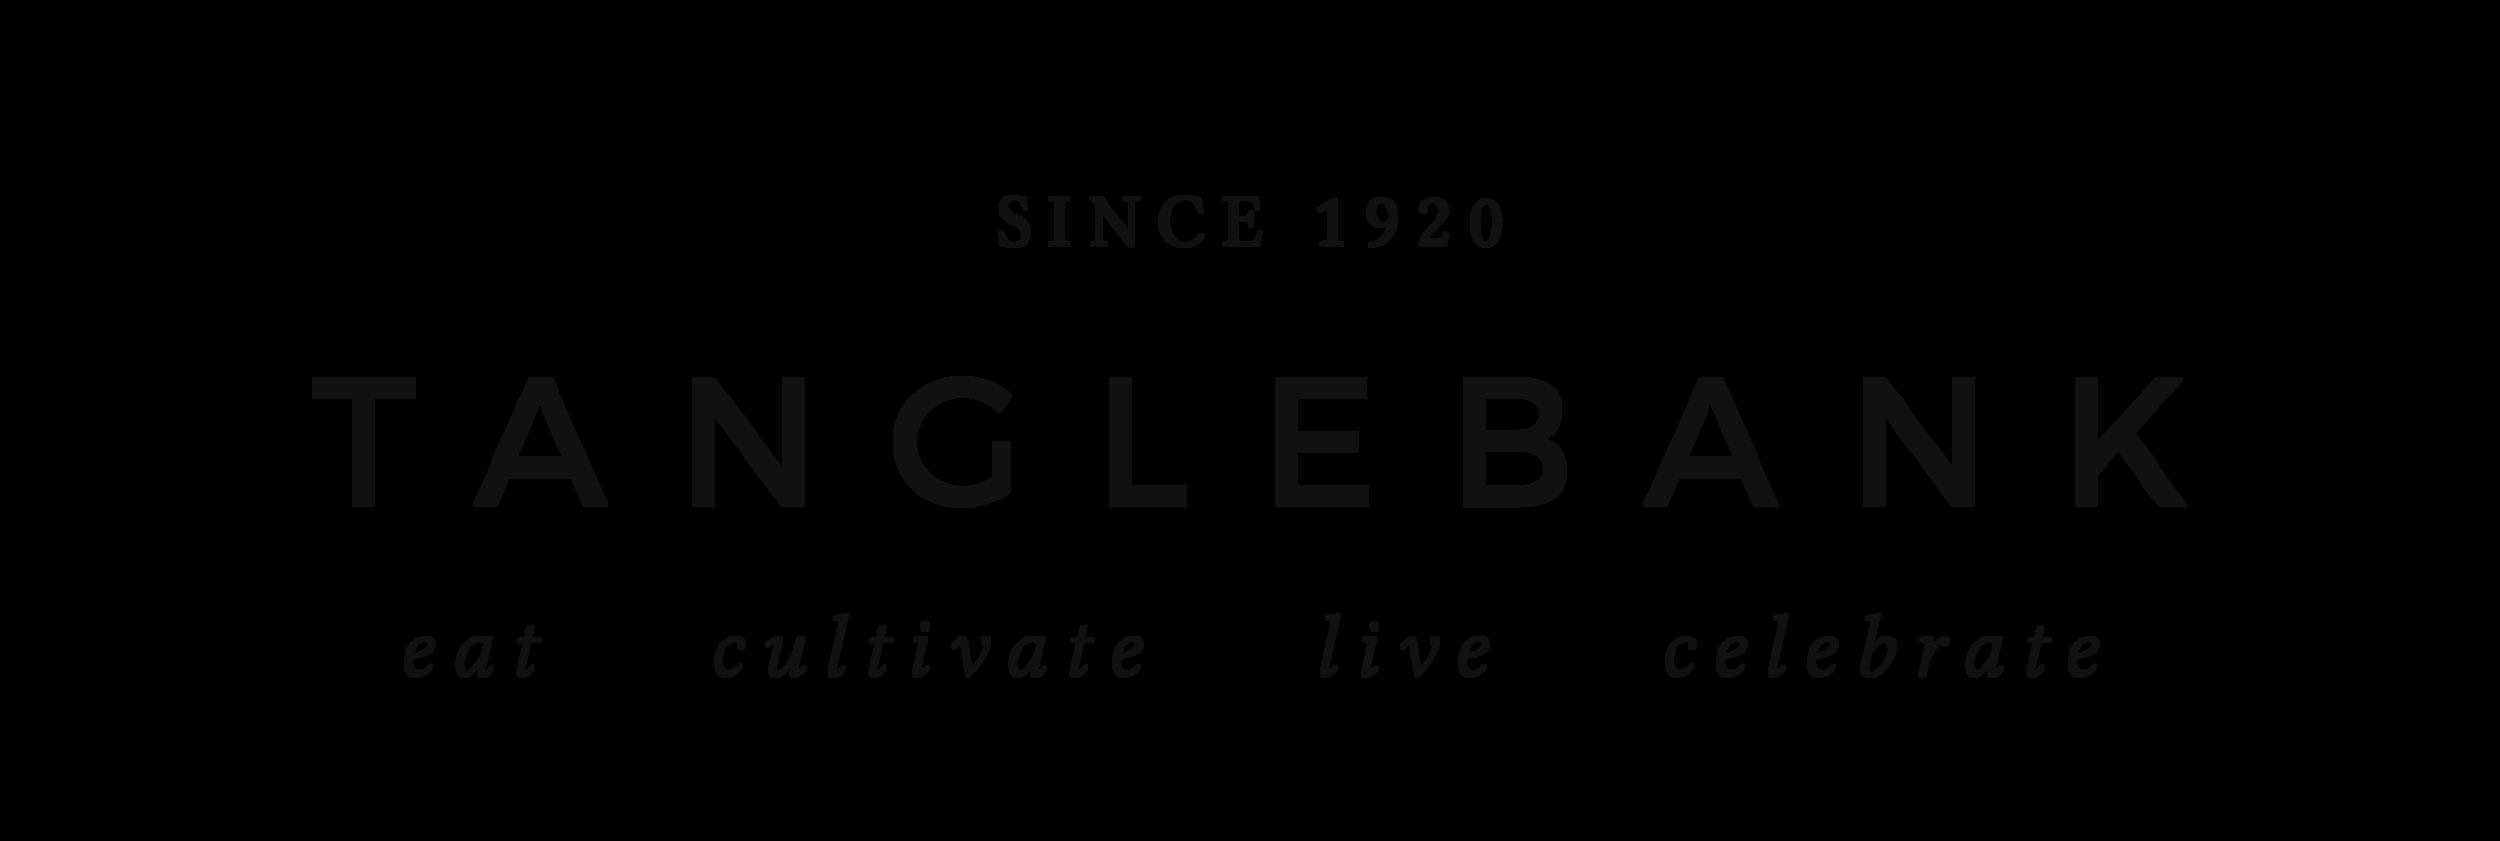 Tanglebank Logo.png